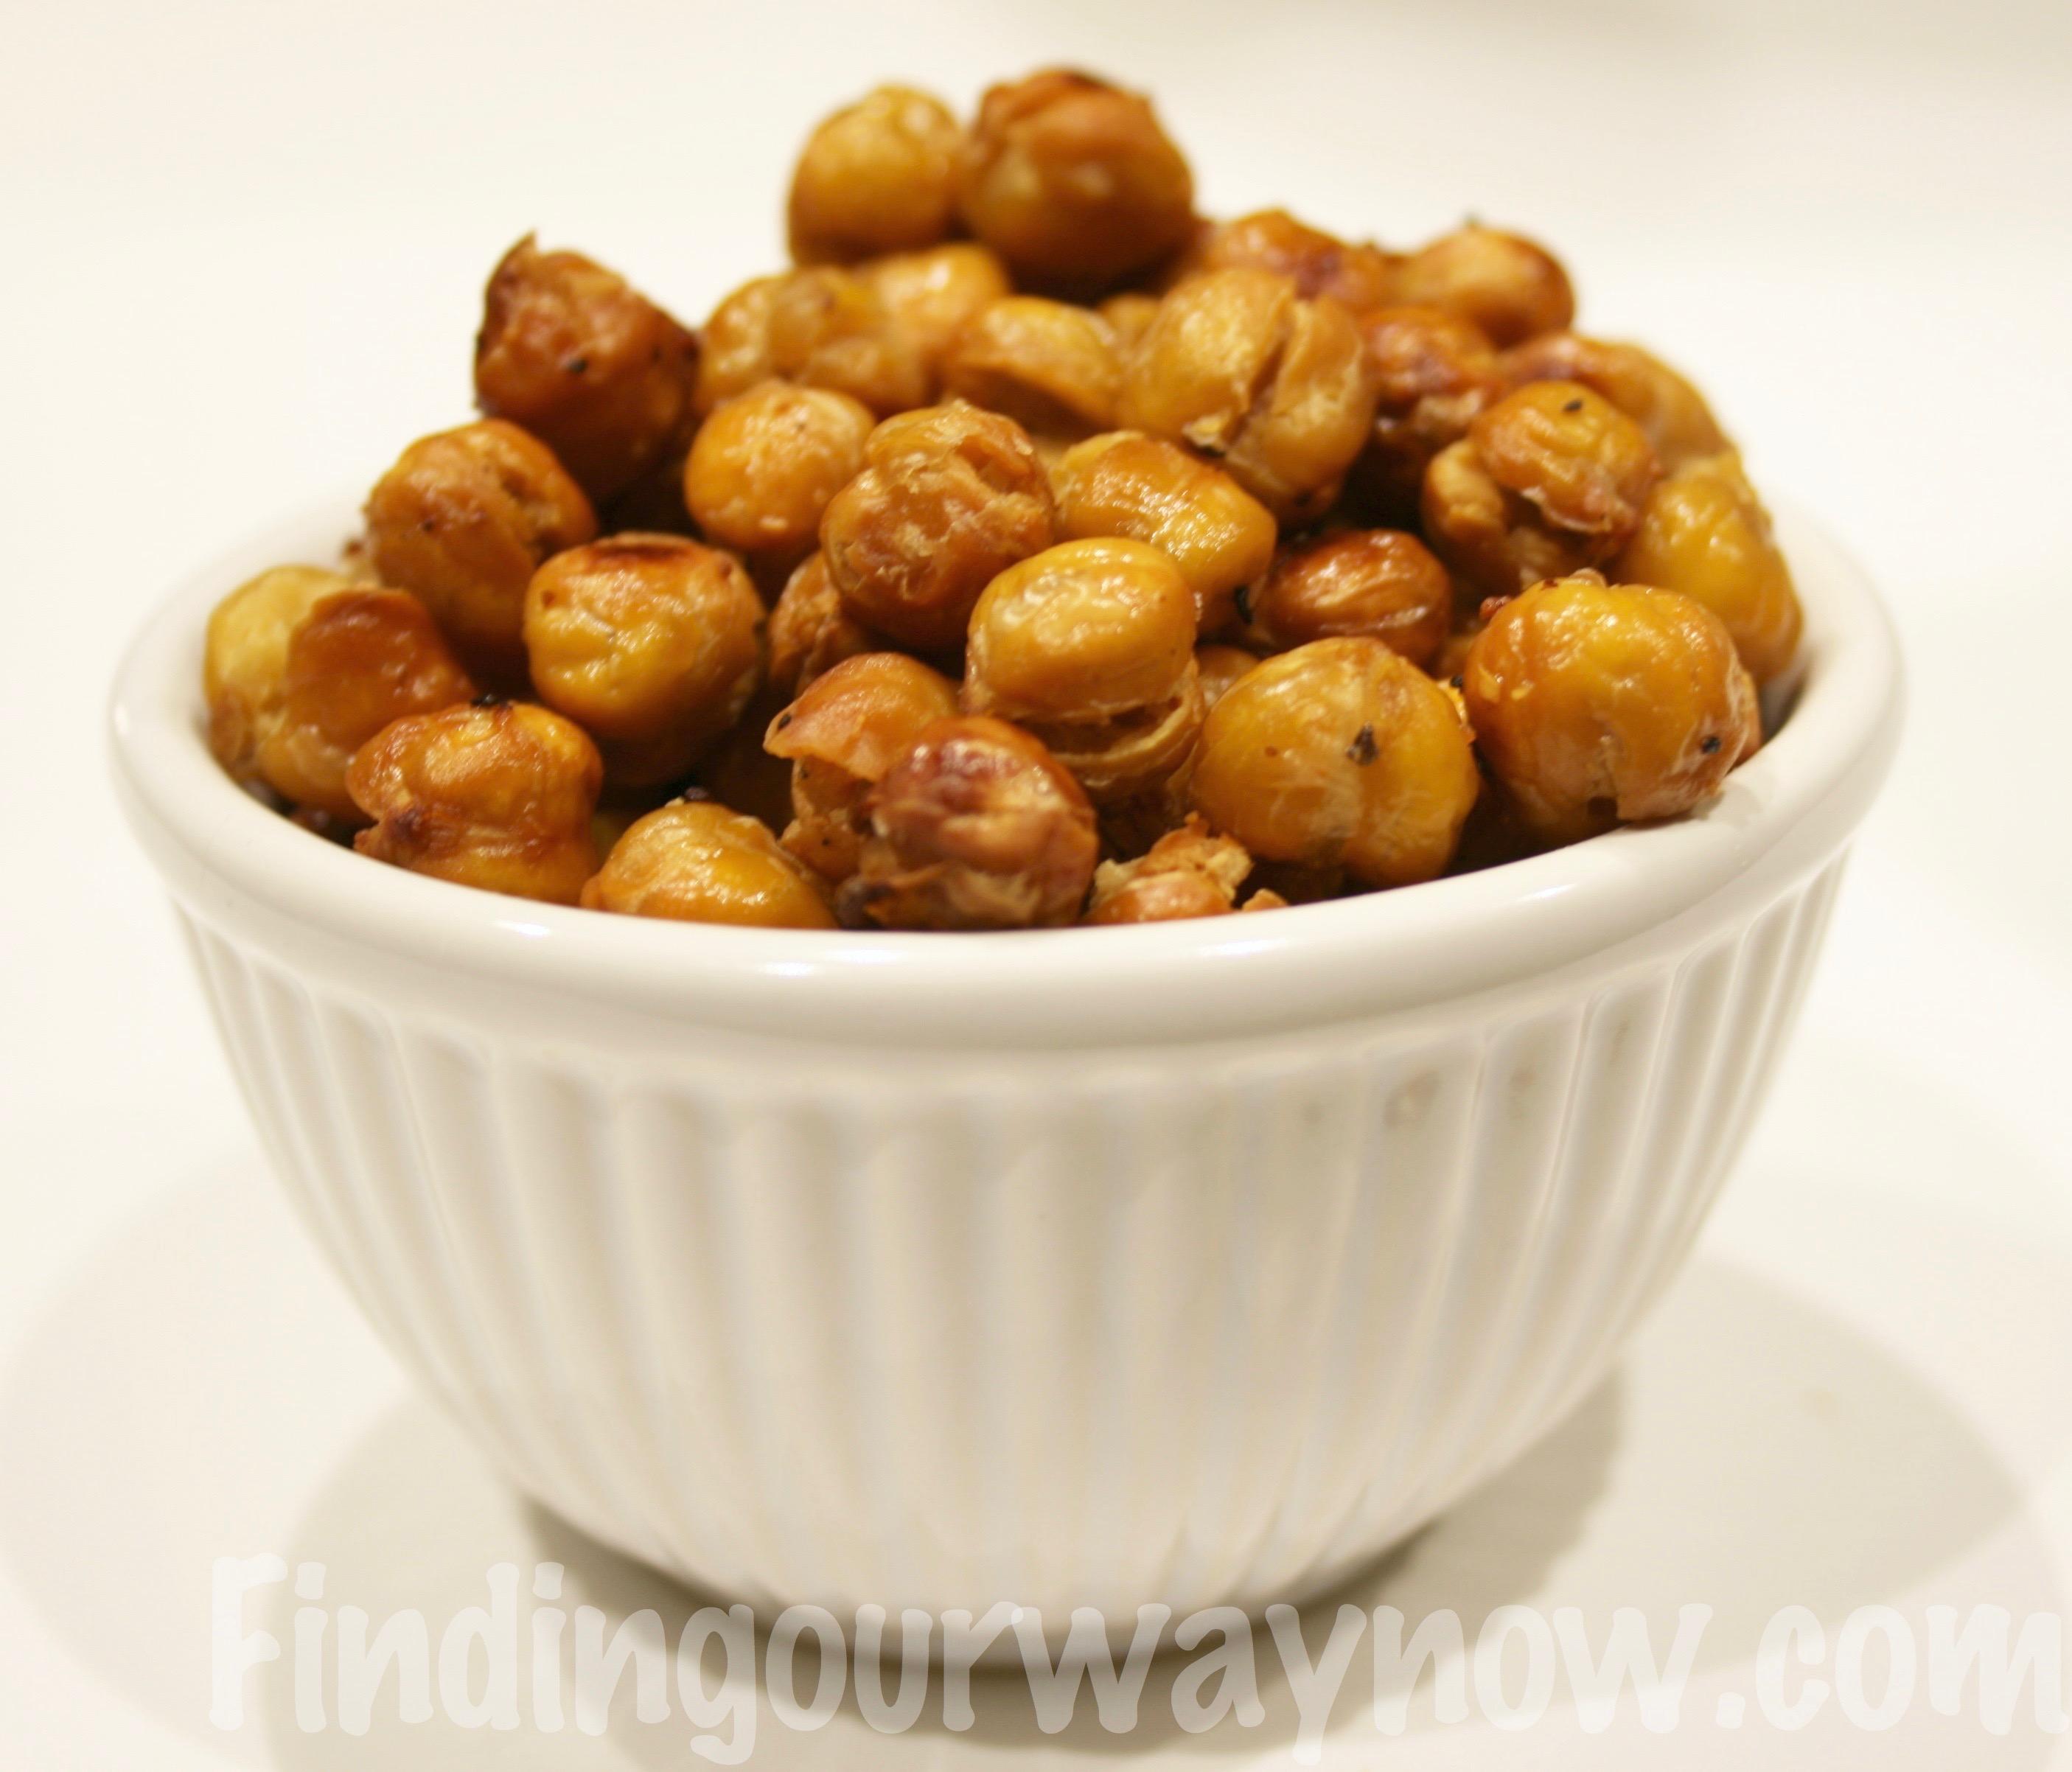 Crunchy Garbanzo Bean Appetizer, findingourwaynow.com